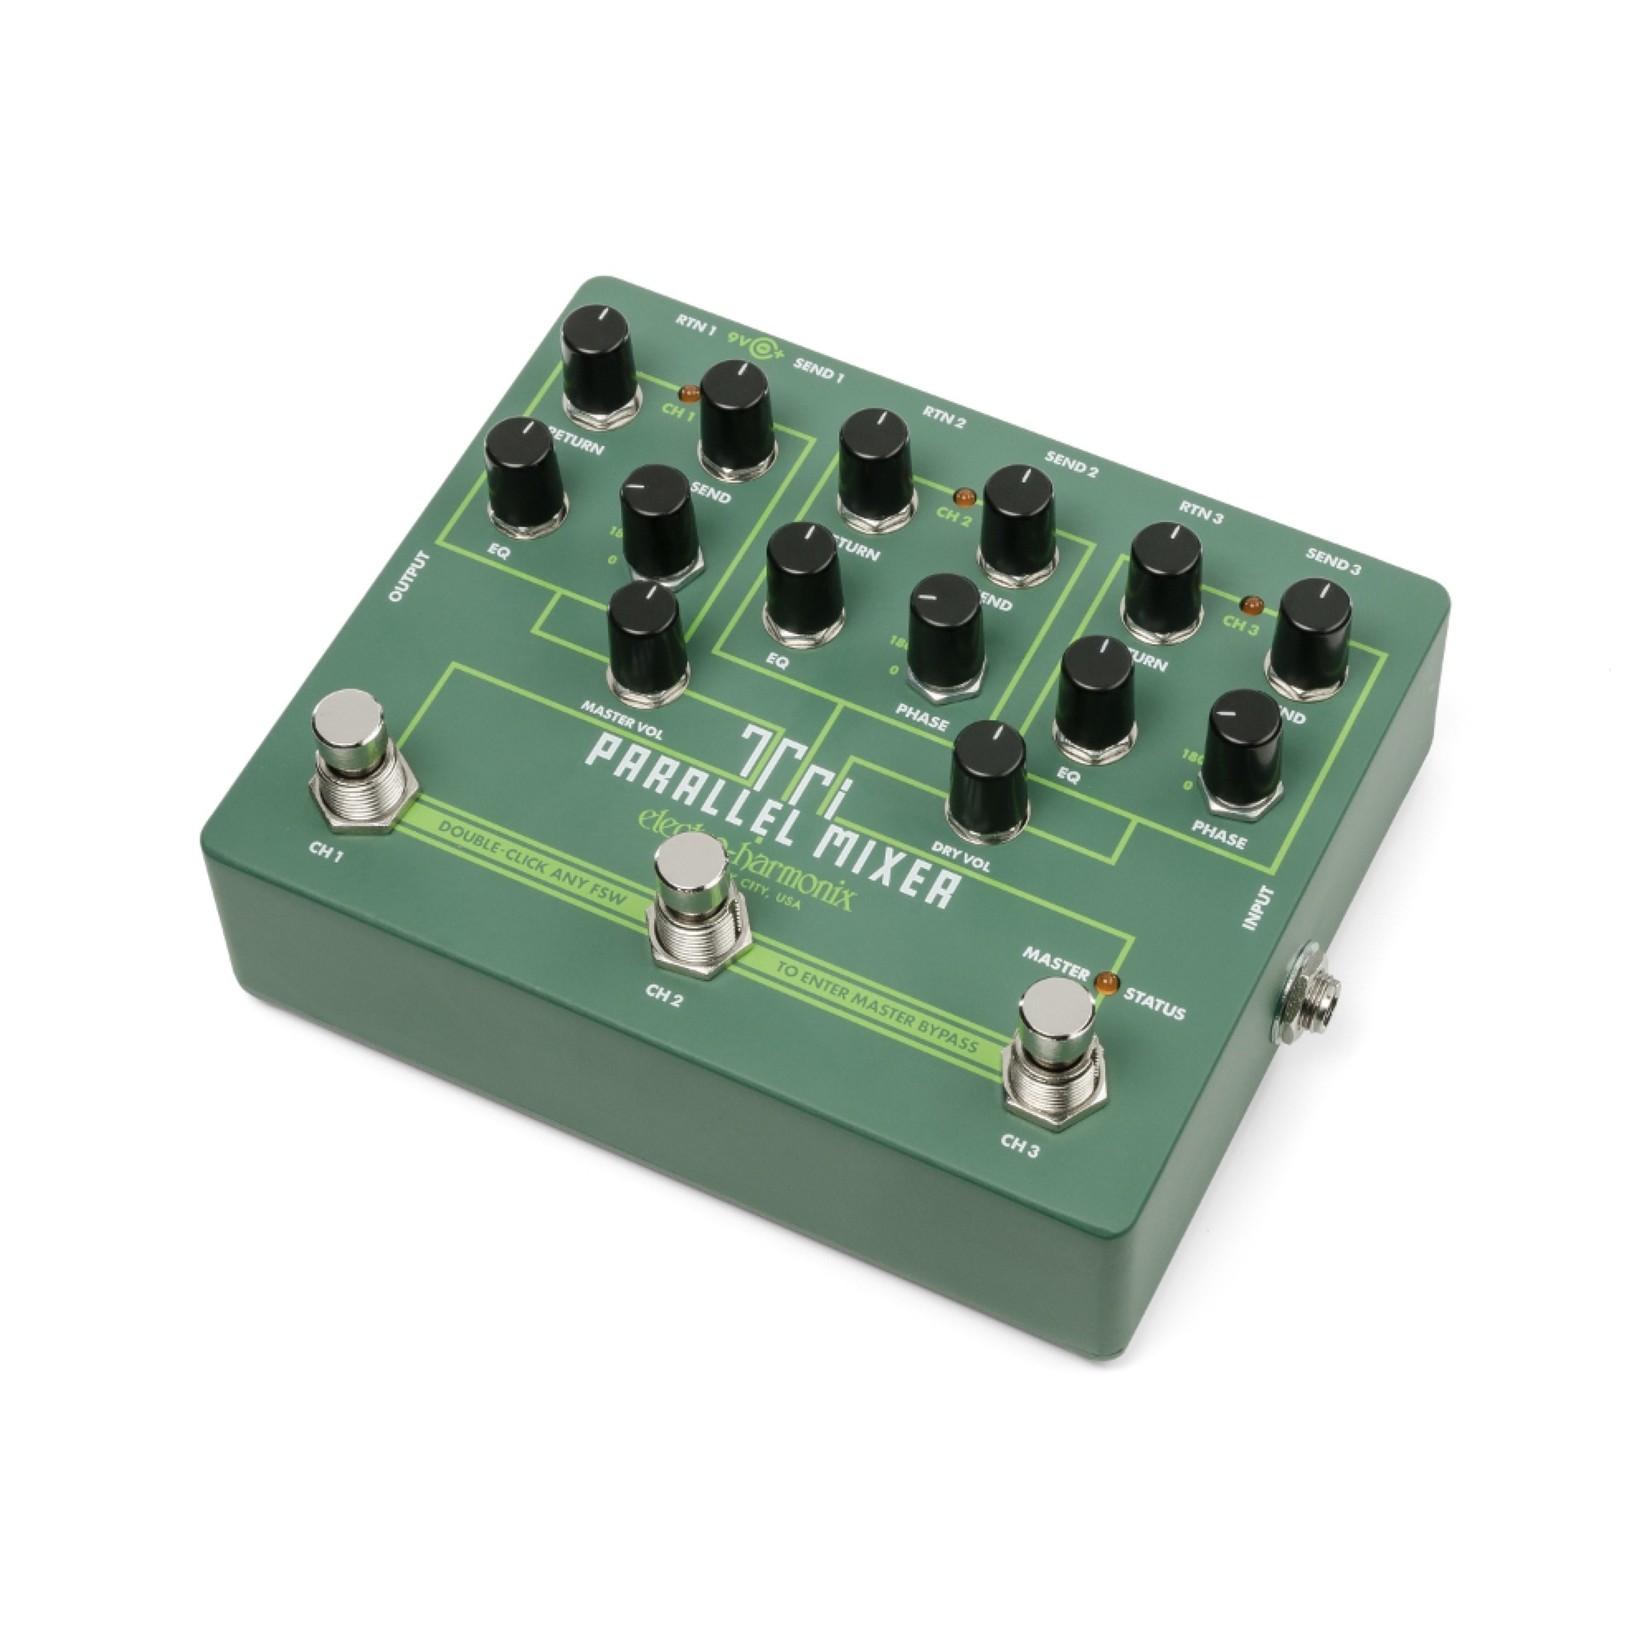 Electro-Harmonix Electro-Harmonix Tri Parallel Mixer, Effects Loop Mixer / Switcher